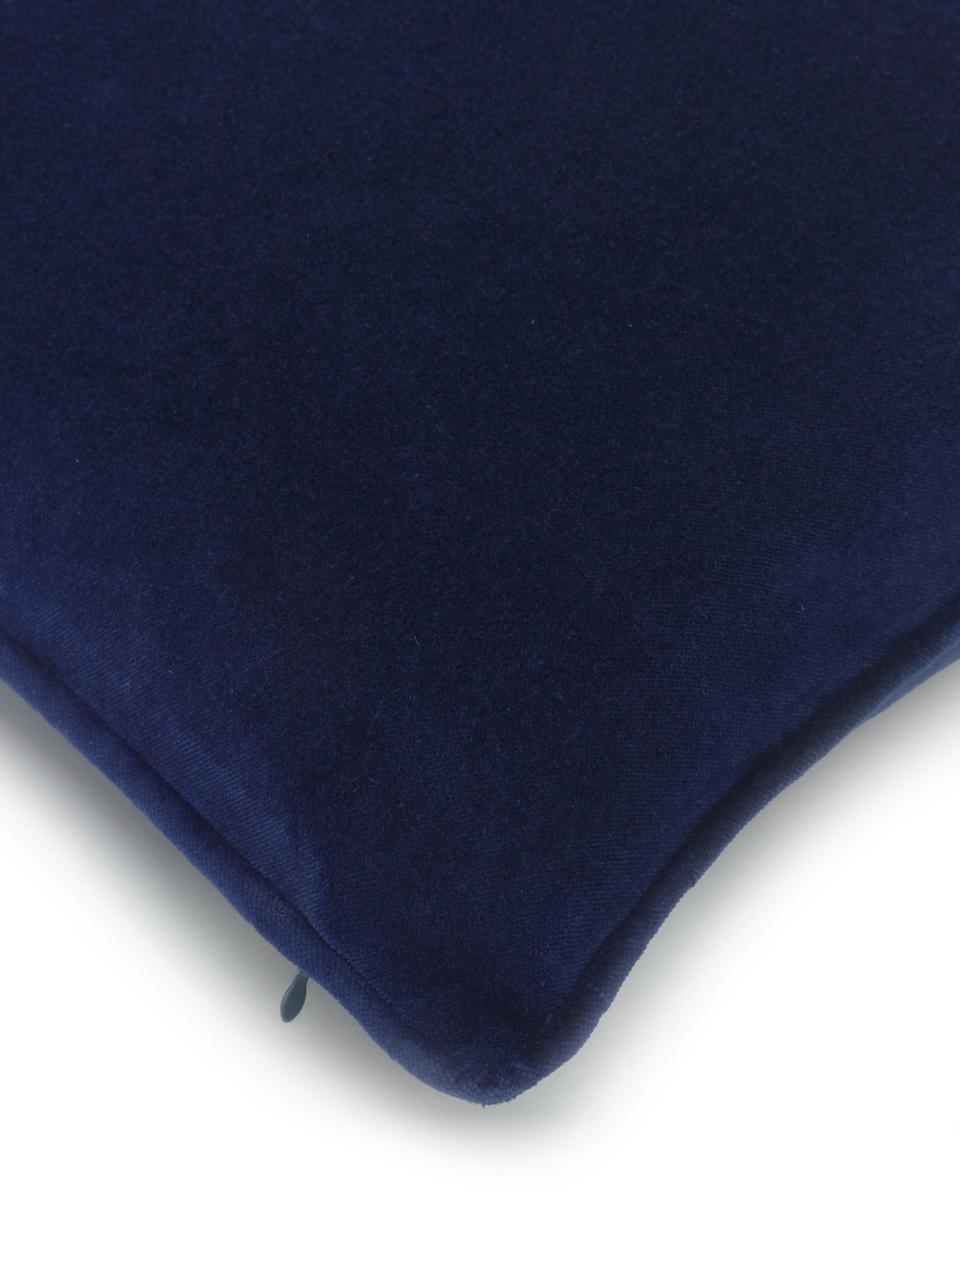 Einfarbige Samt-Kissenhülle Dana in Marineblau, 100% Baumwollsamt, Marineblau, 40 x 40 cm